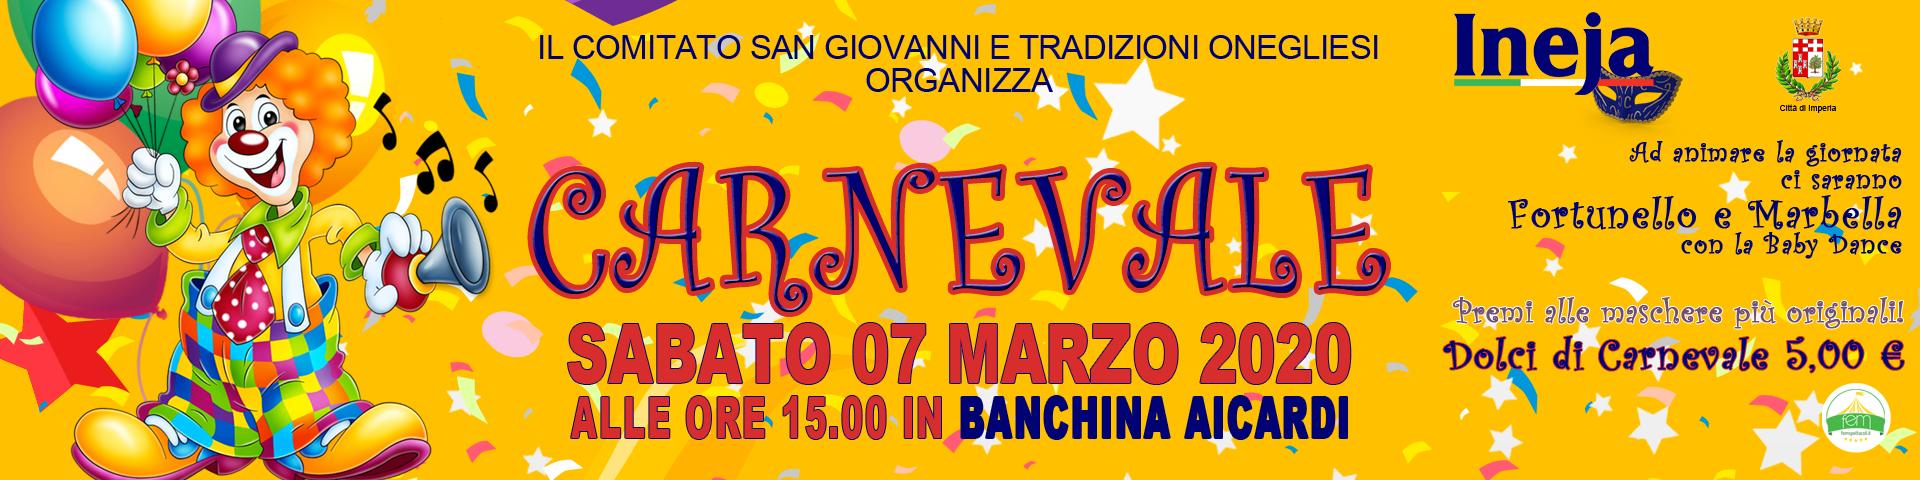 banner-carnevale-2020